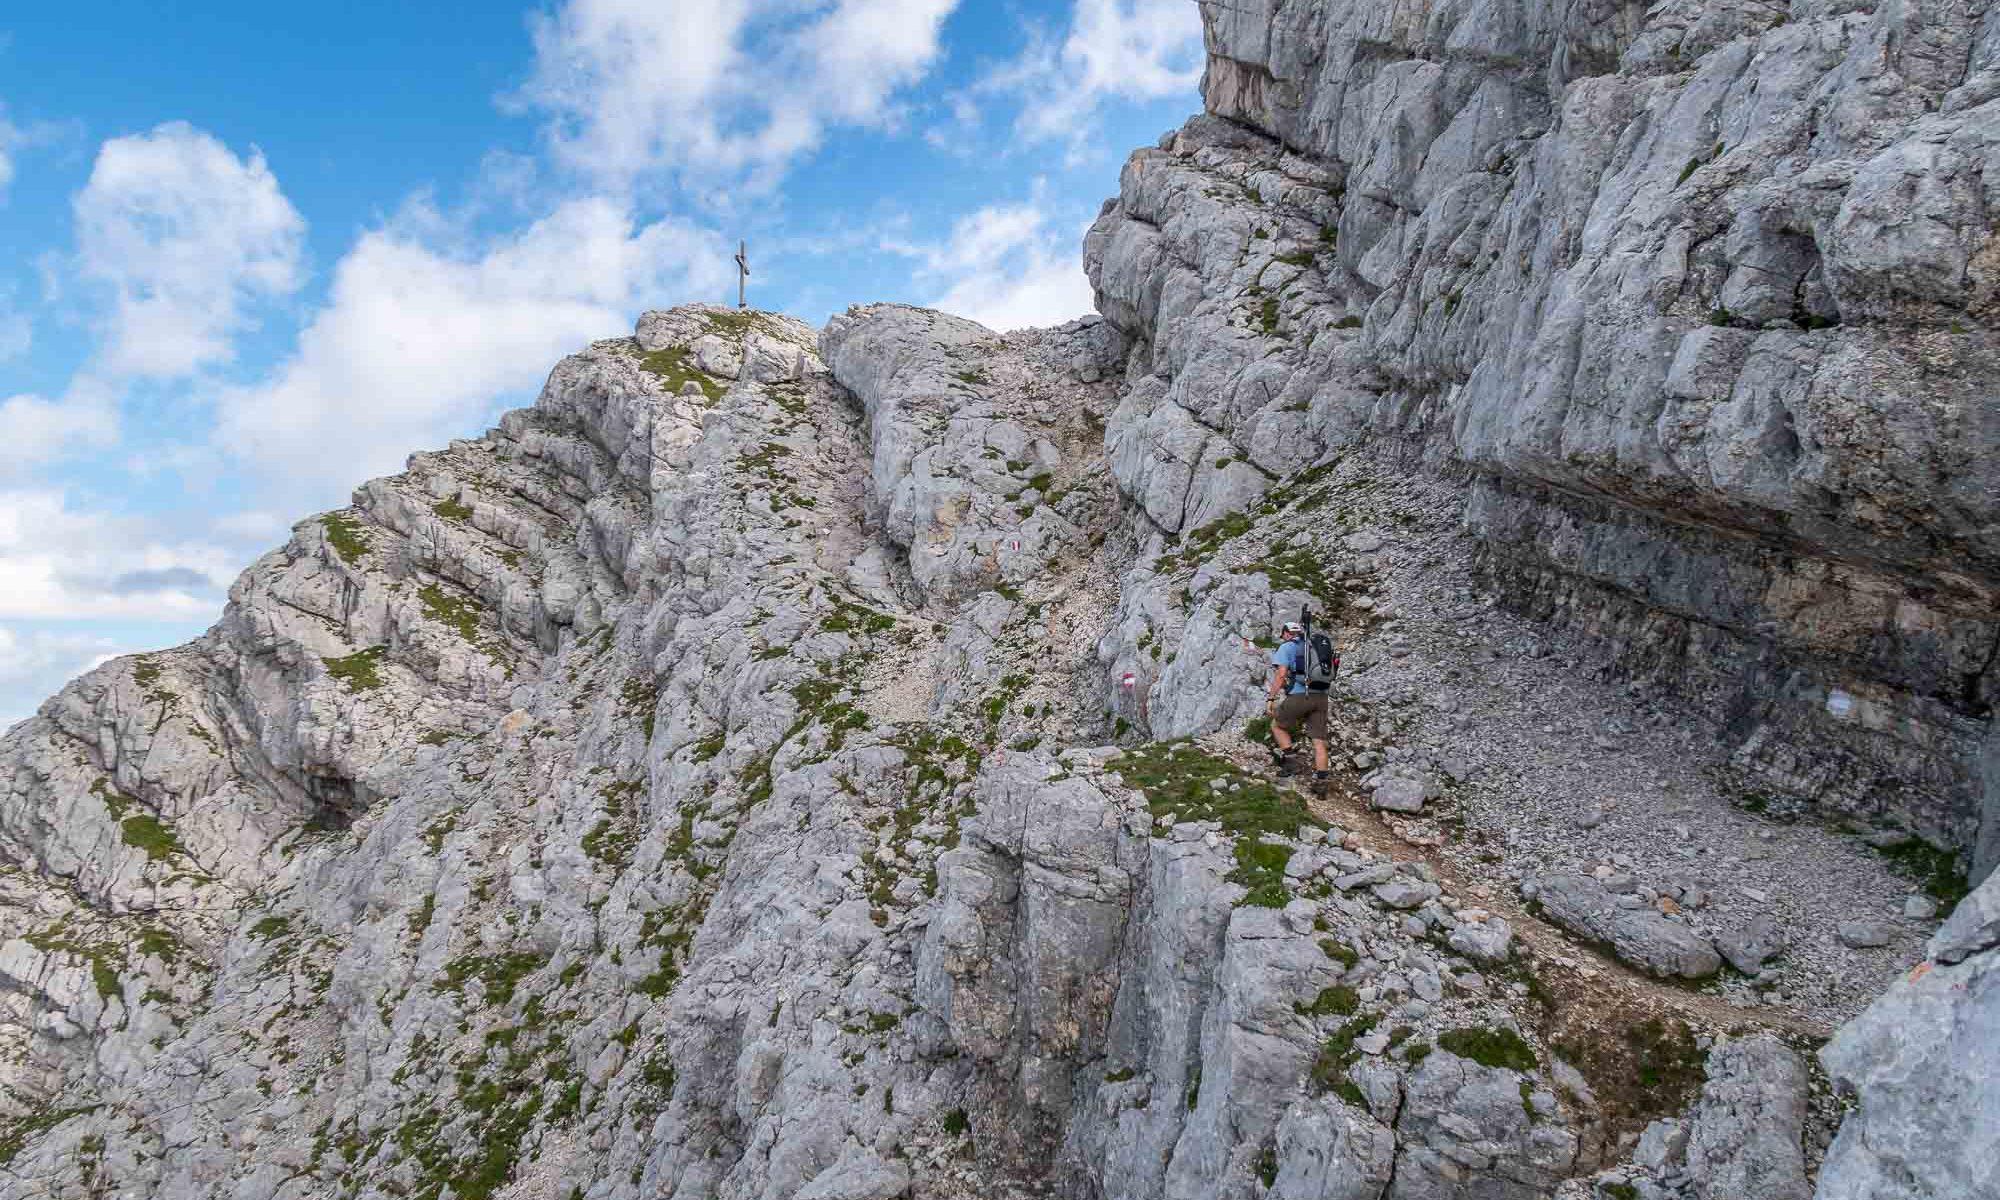 Rotgschirr 2261m - am Gipfel (2016.07.30)